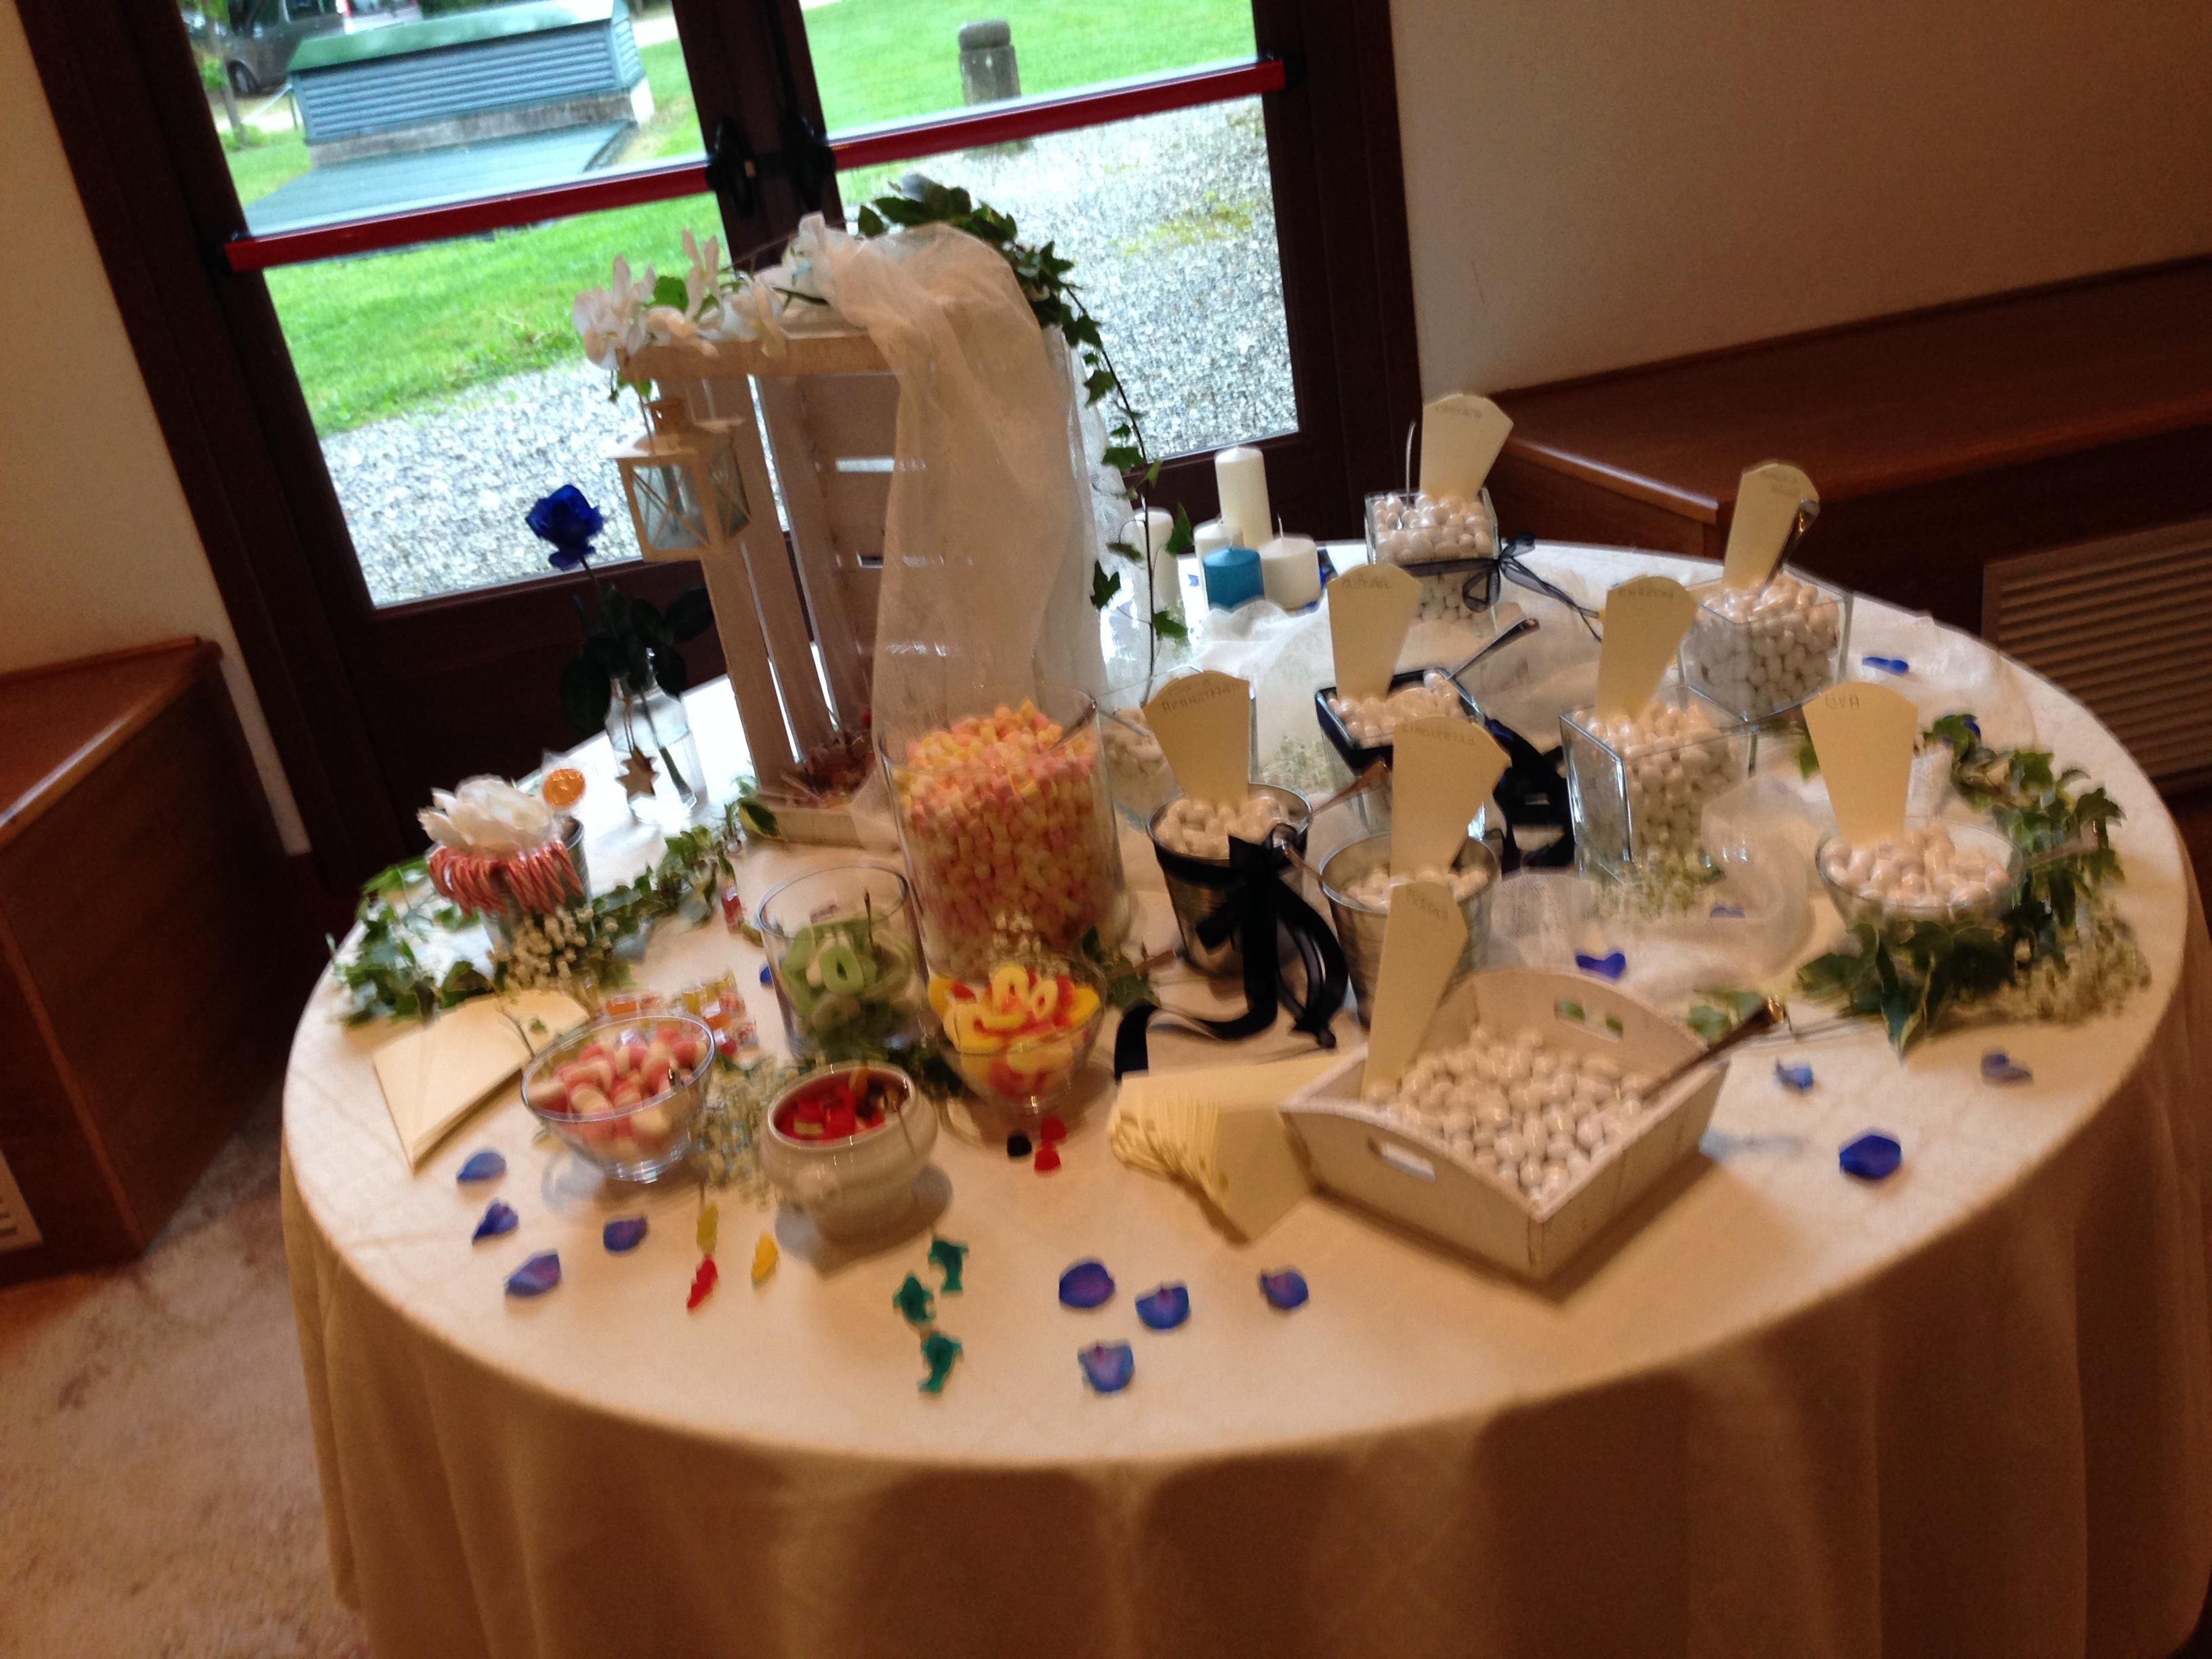 Matrimonio In Blu E Bianco : Matrimonio bianco e blu